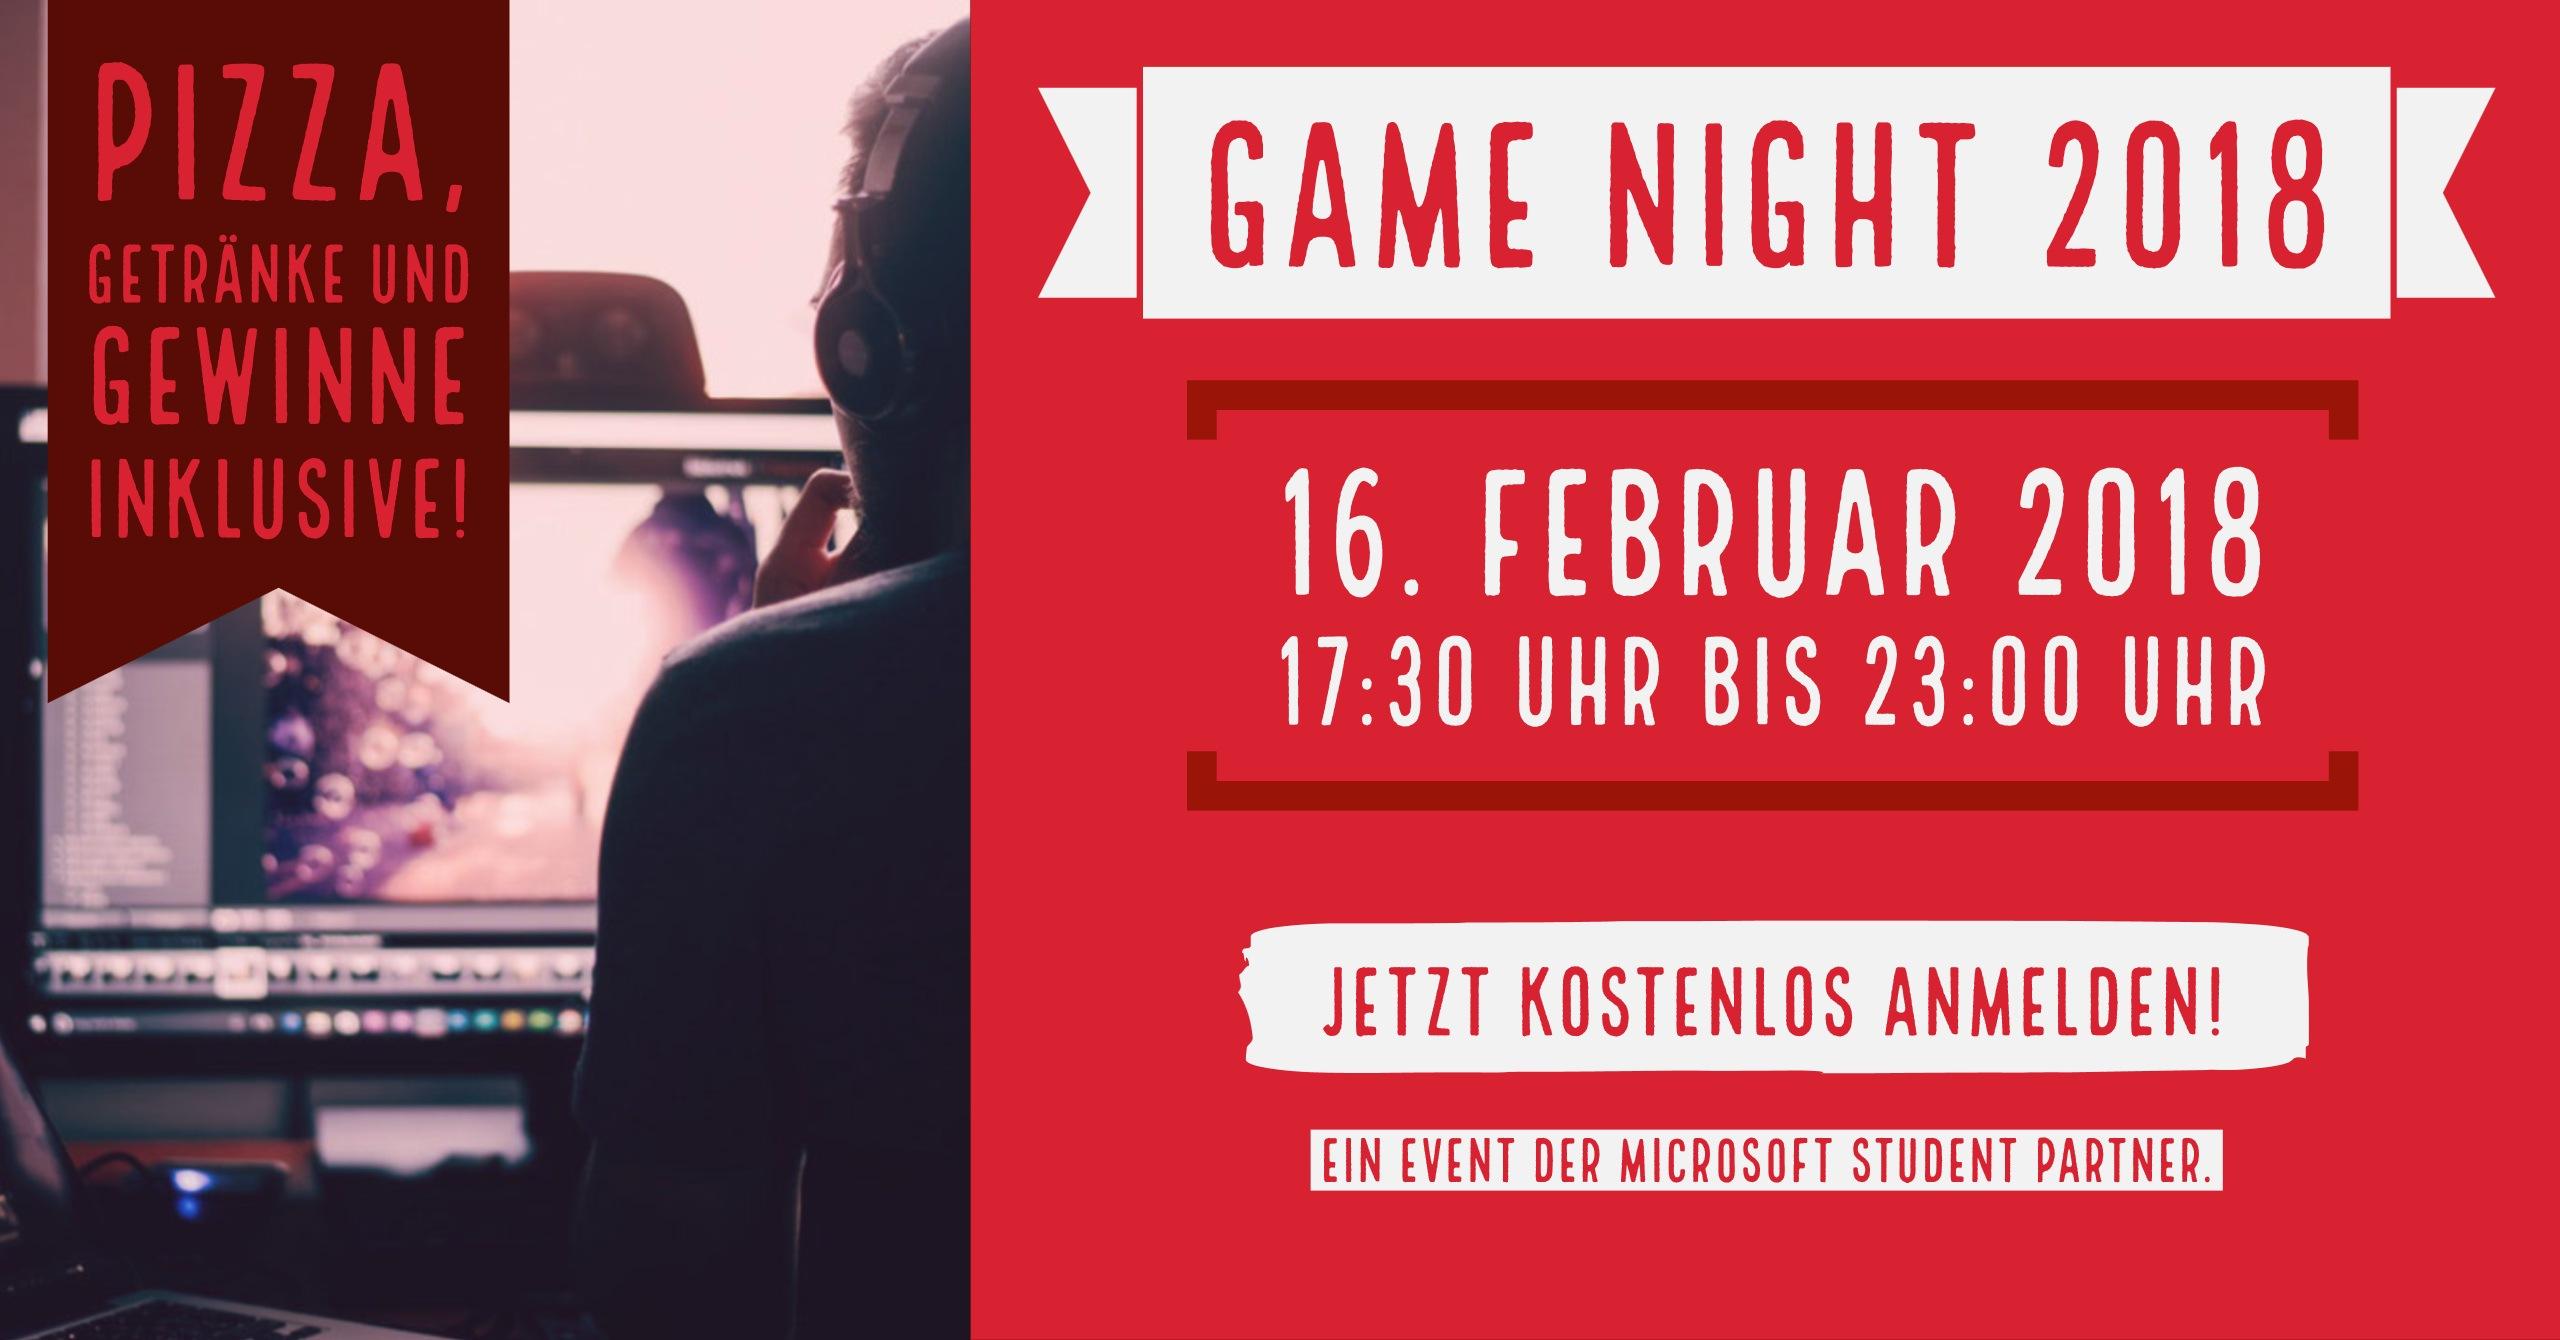 Event-Tipp: Game Night 2018 in Bergisch Gladbach am 16. Februar